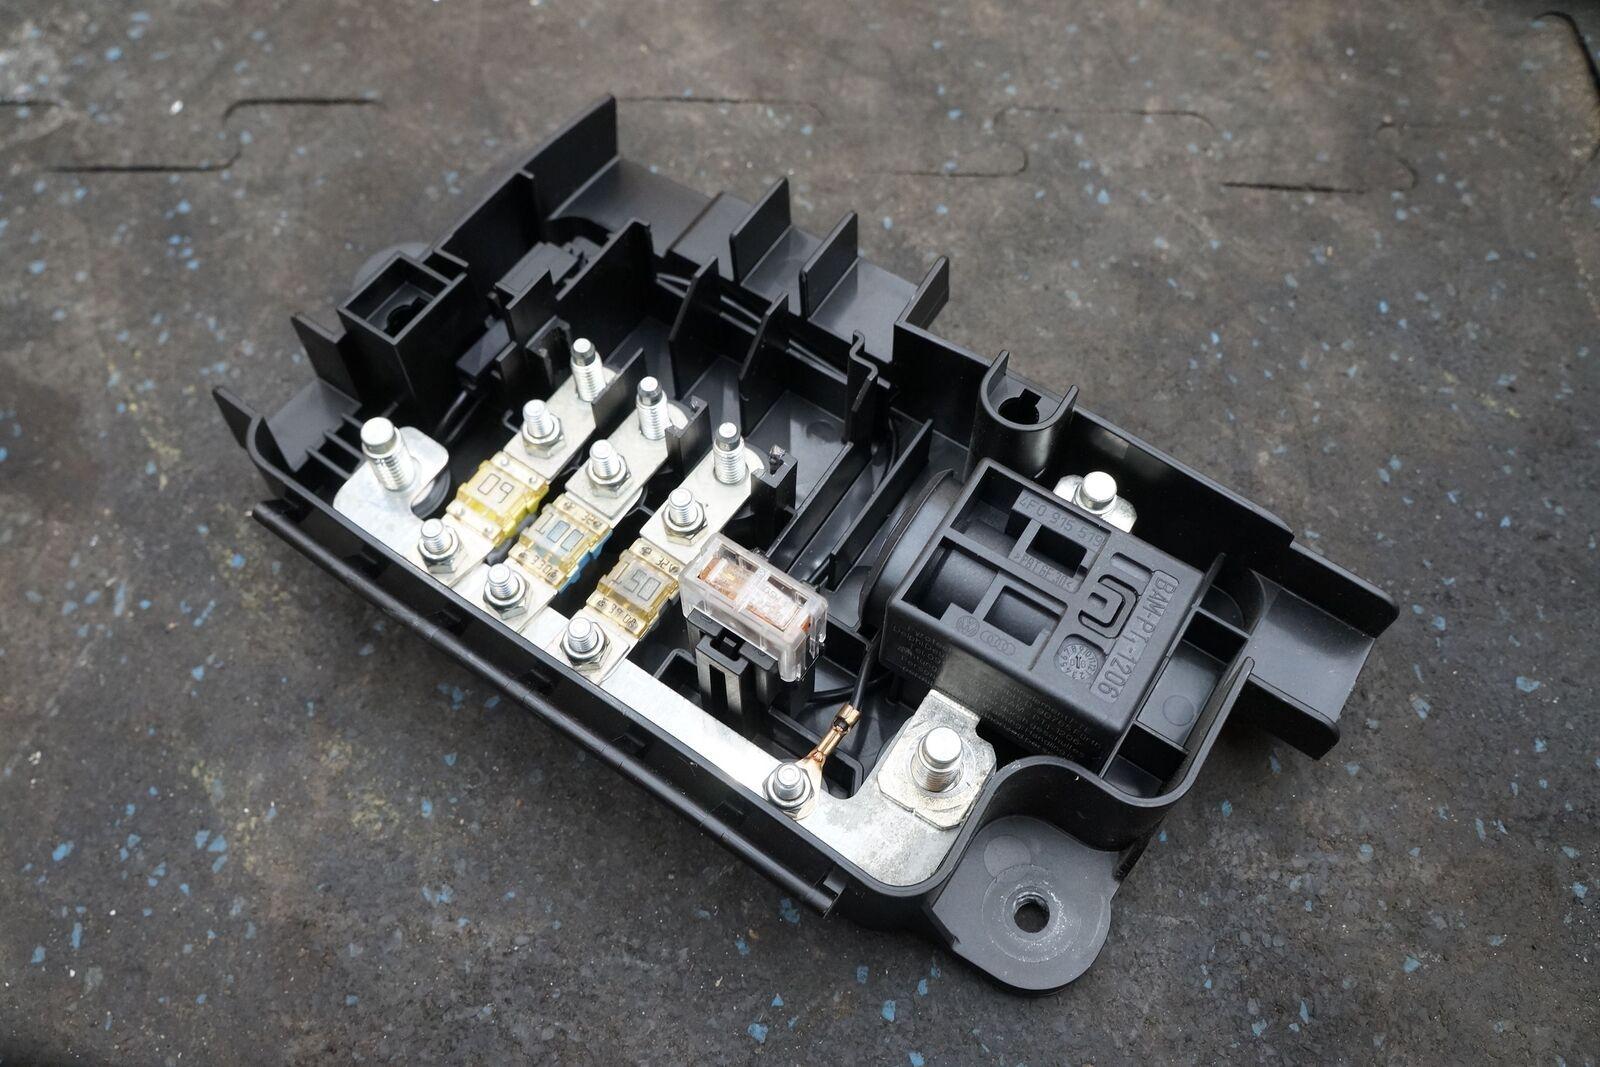 audi r8 fuse box wiring schematic diagram rh aikidorodez com 2008 audi r8  fuse box diagram